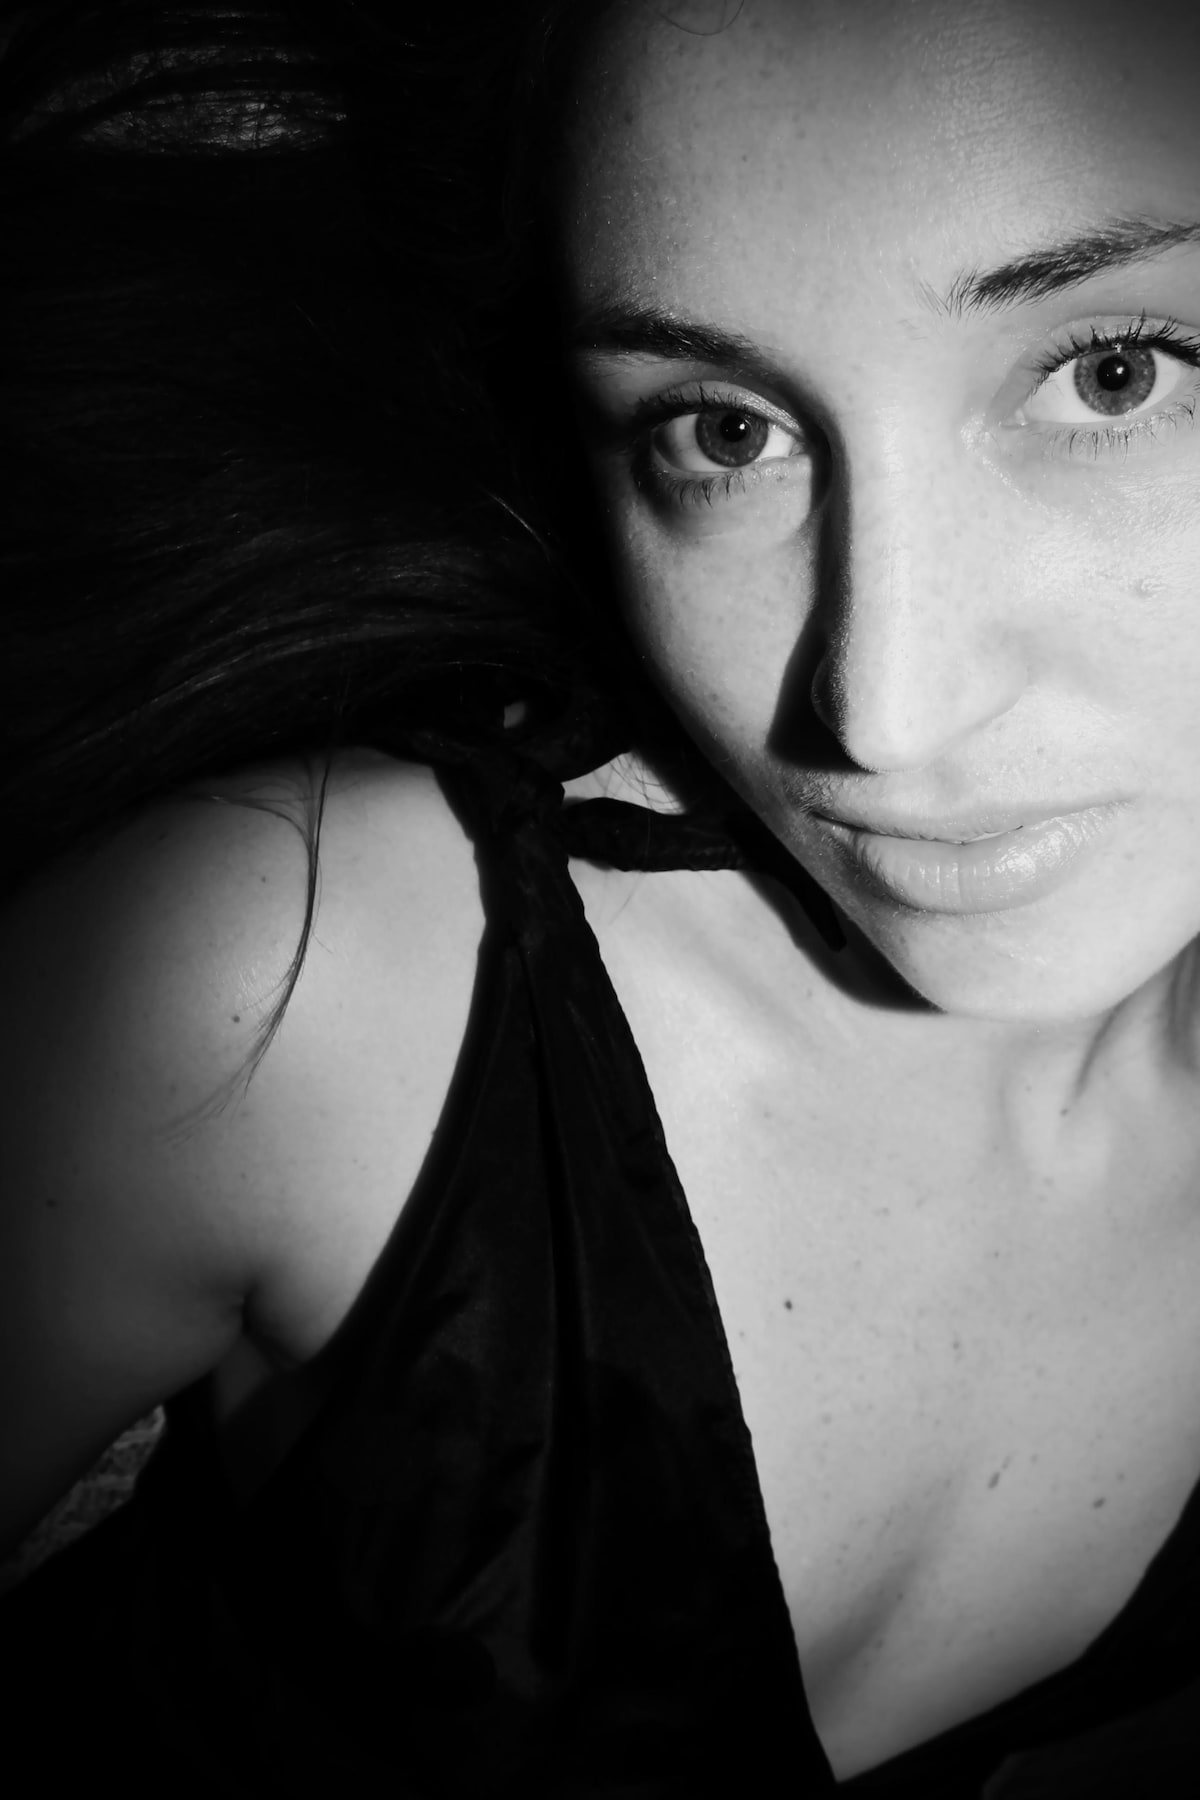 Lucia from Bondi Beach